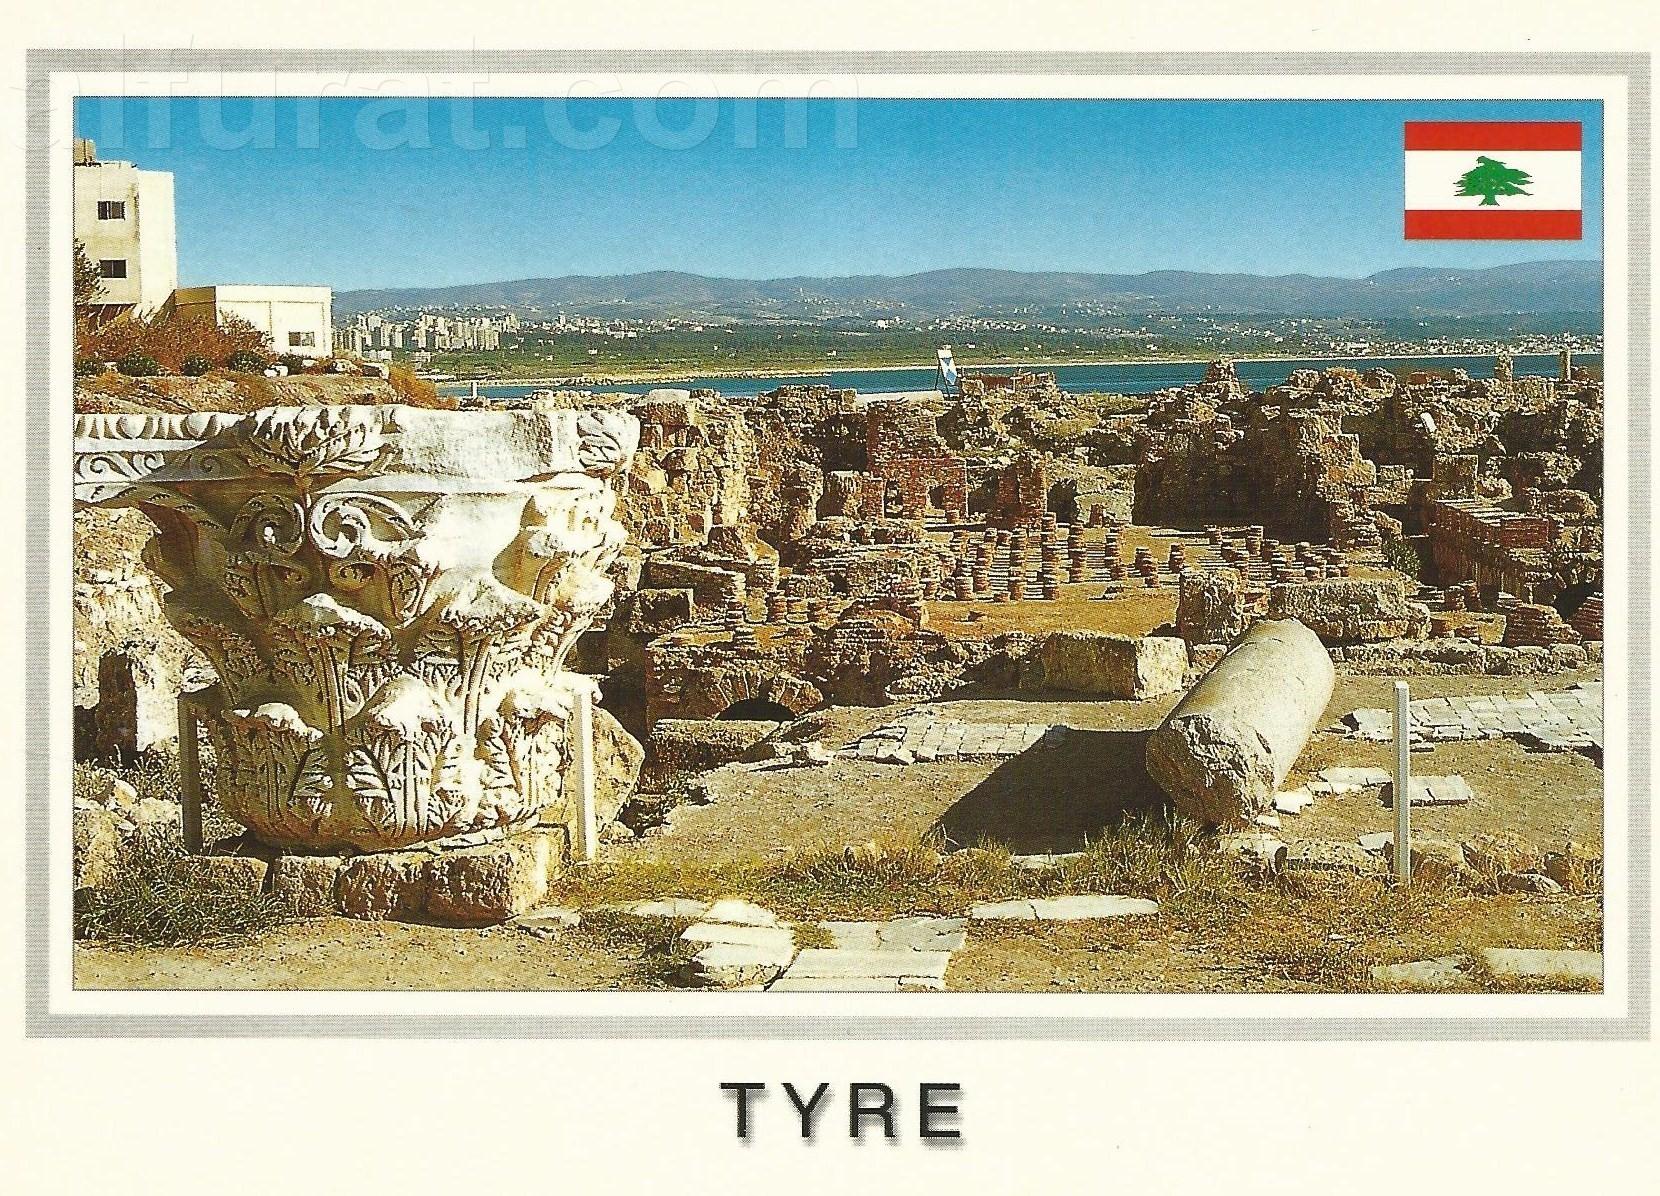 Tyre - The Roman Road Thermae ( Public Baths) C 941   صور